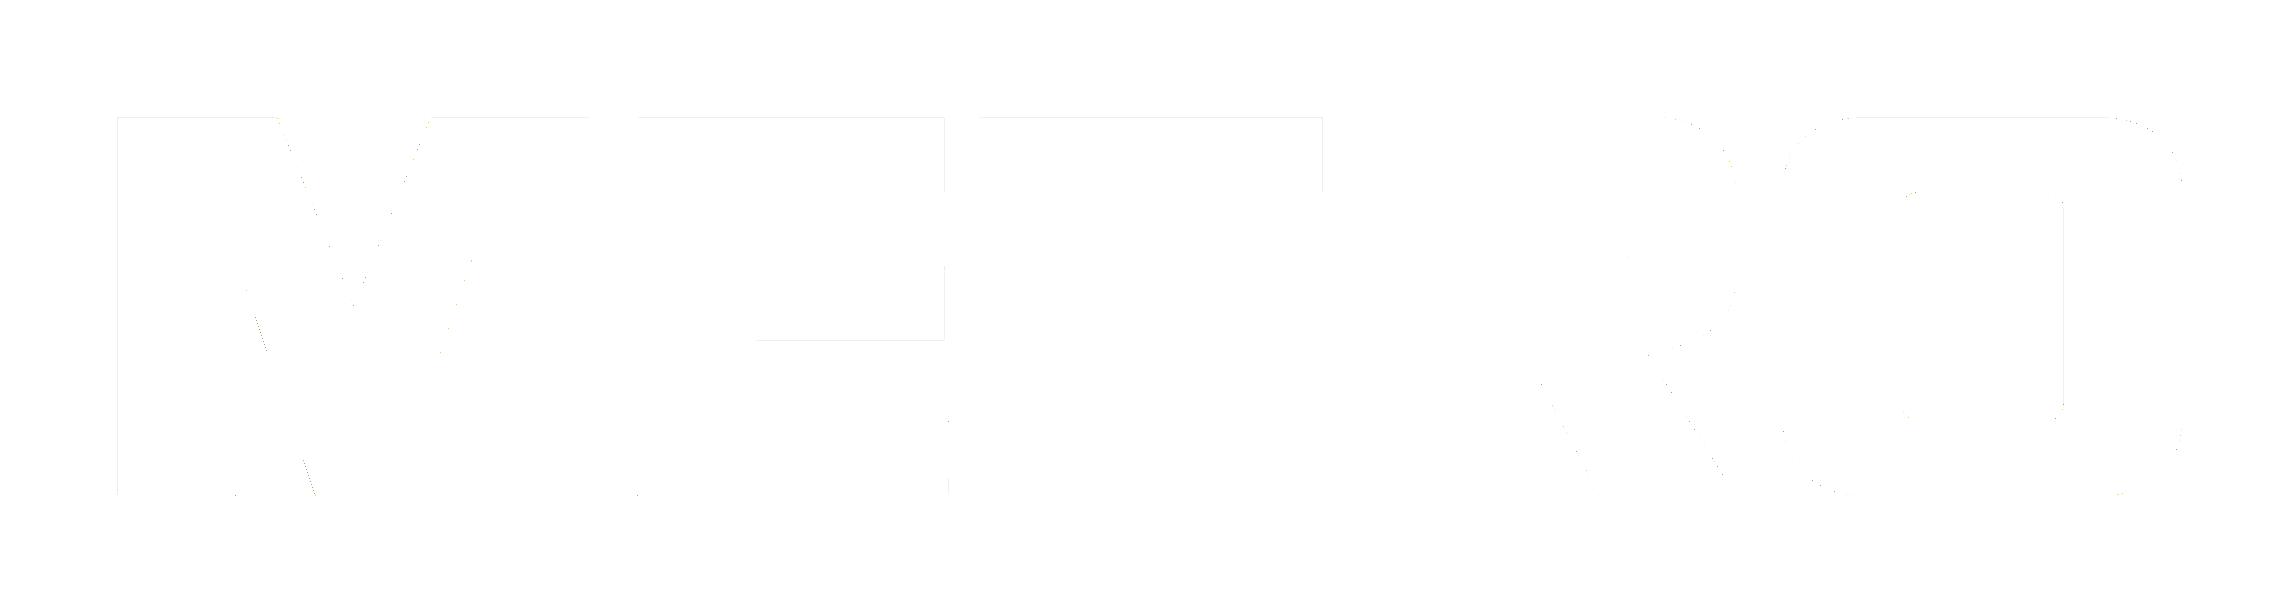 Metro_weiss